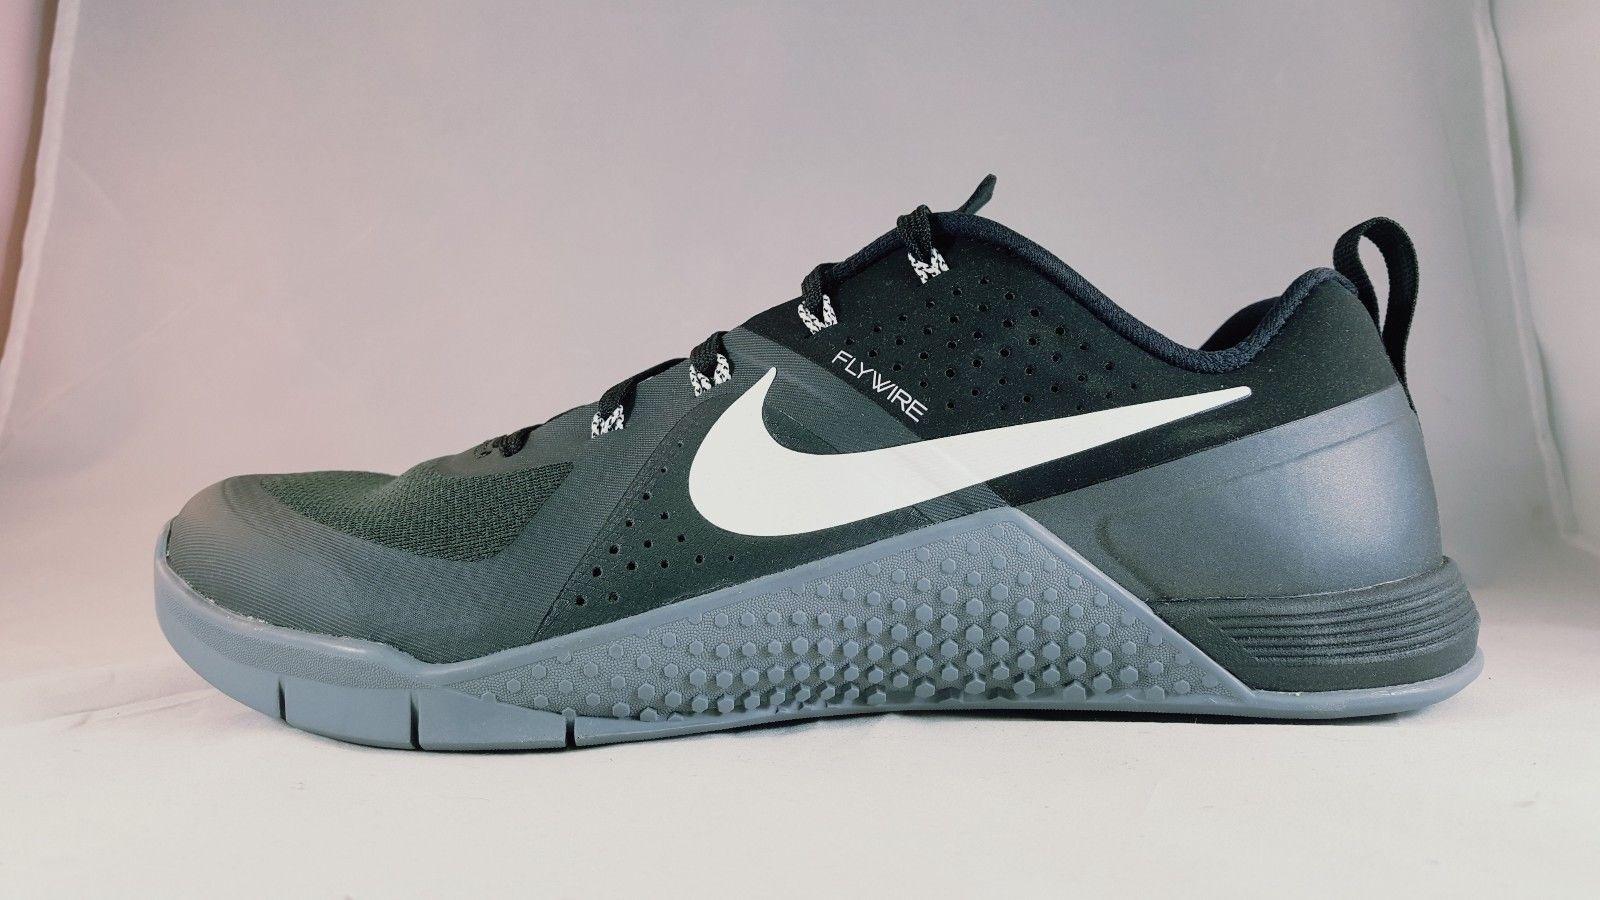 Seasonal clearance sale Nike Metcon 1 Men's Cross Training Shoe 704688 001 Comfortable